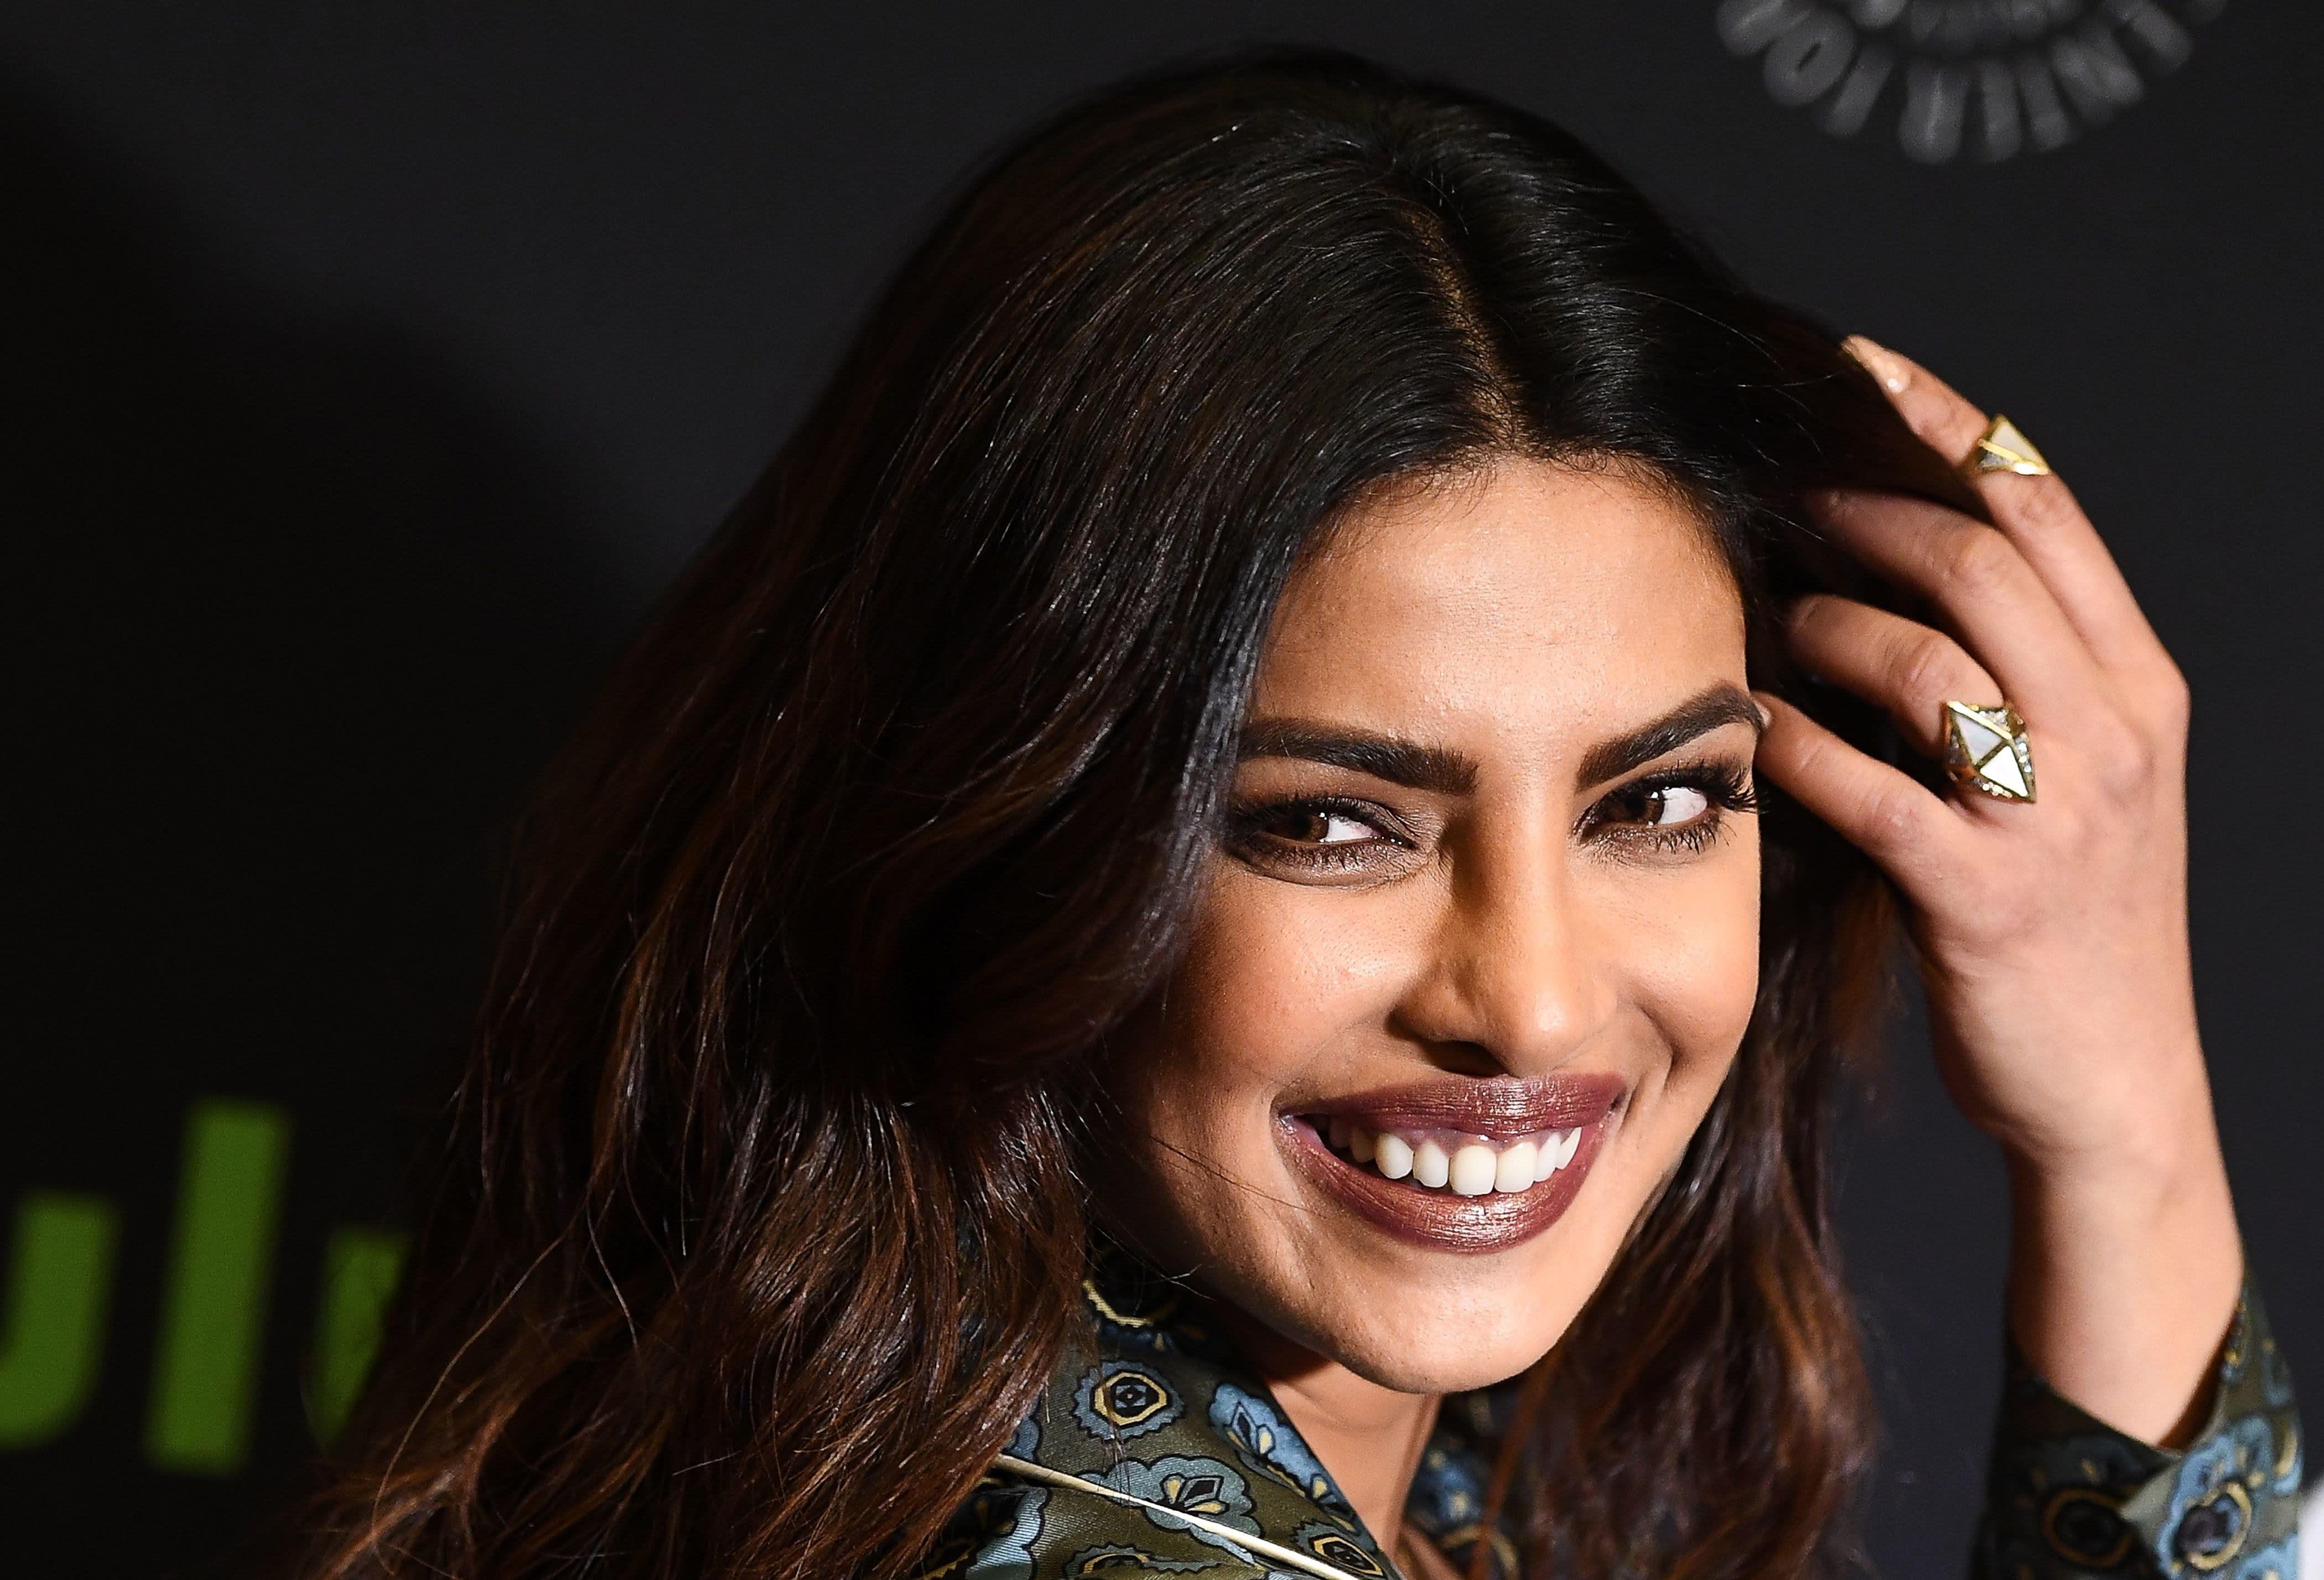 priyanka chopra nailed 90s brown lipstick